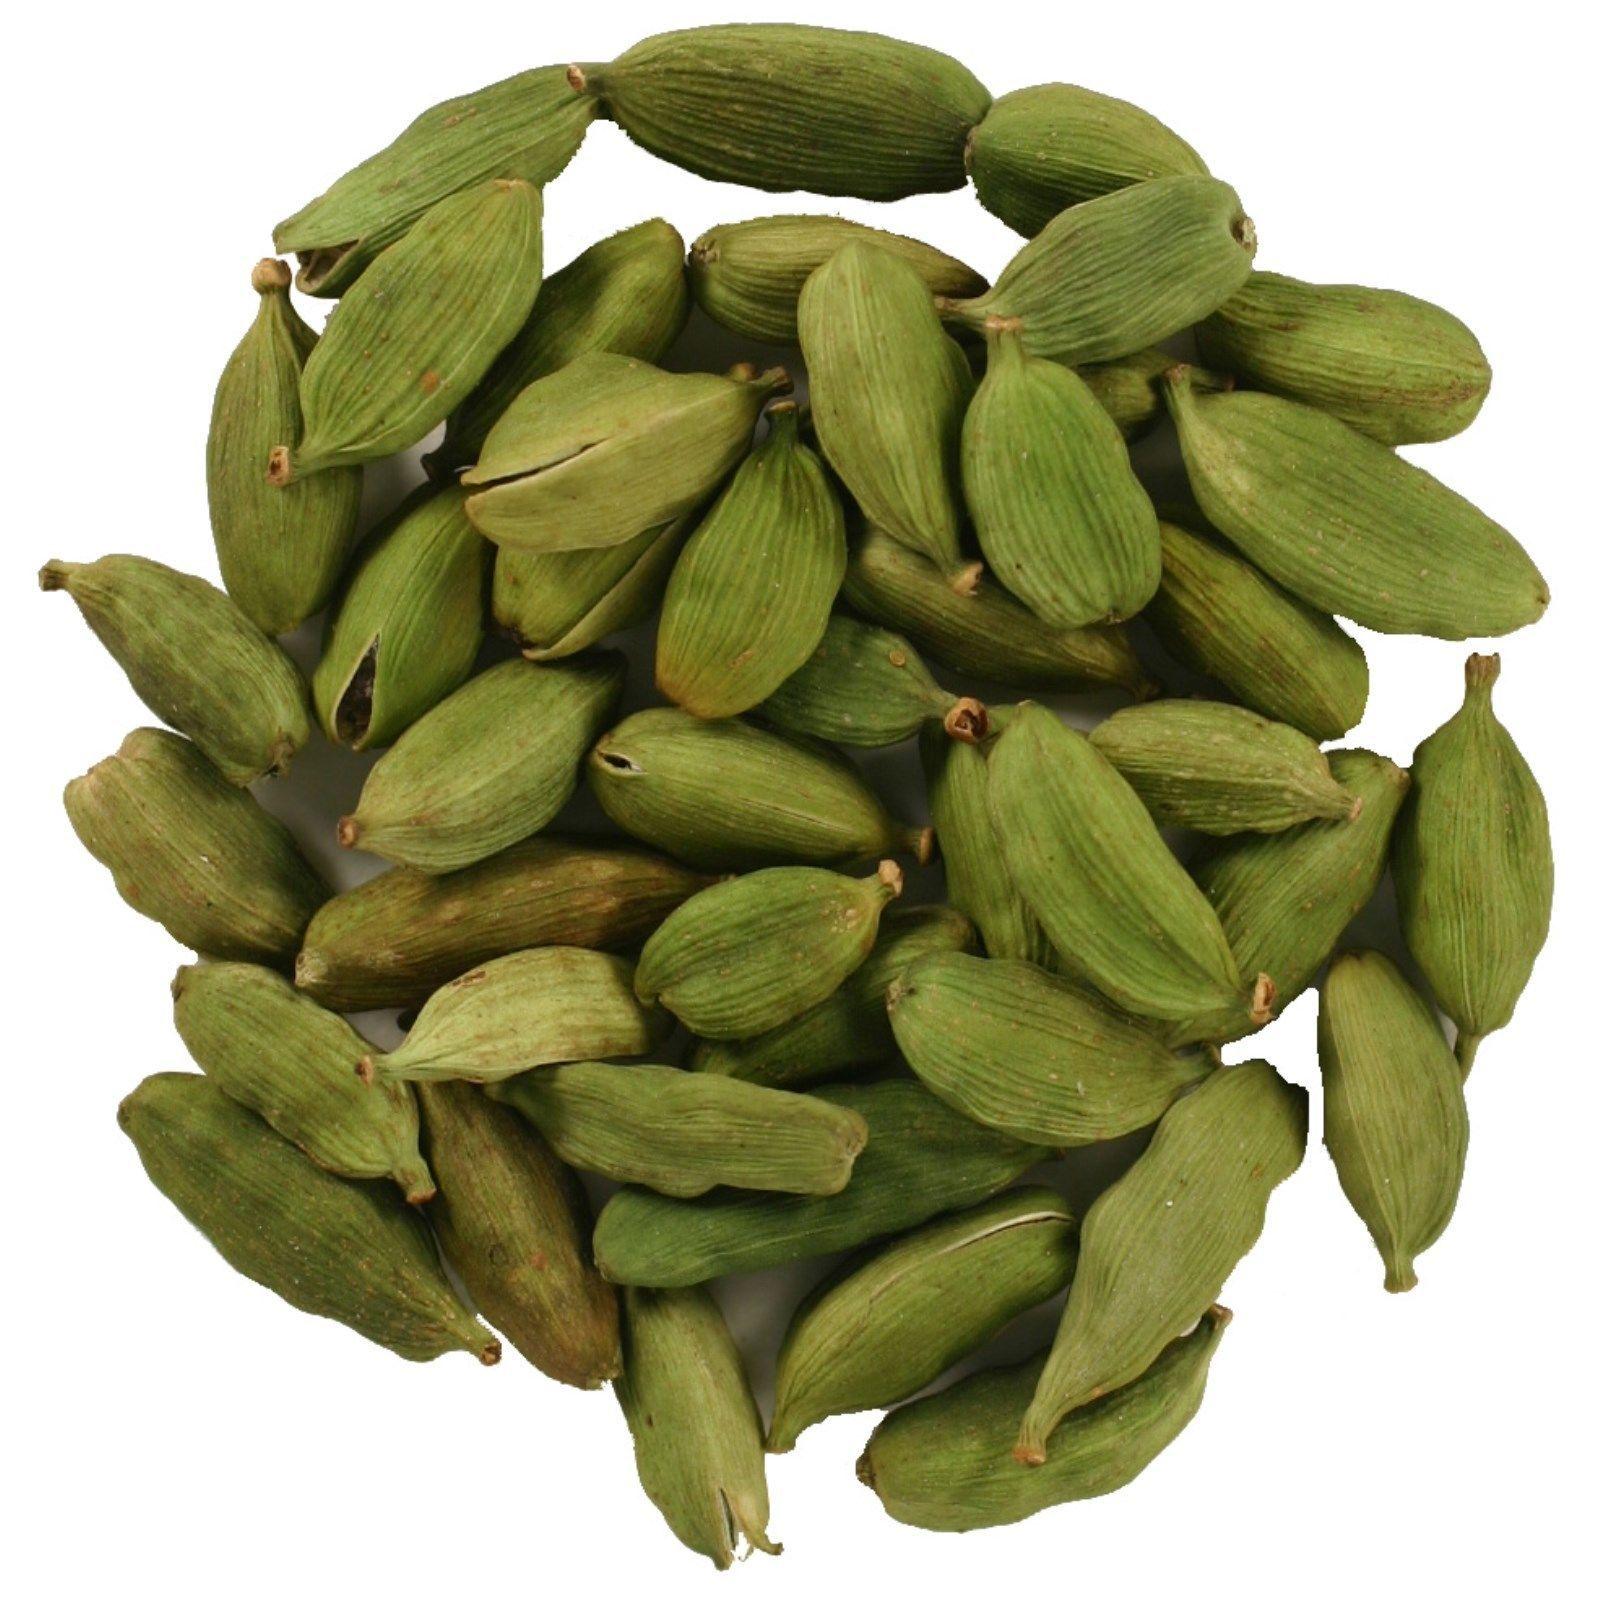 100g 3.5oz WHOLE Green Whole Cardamom Pods Cardamon India FREE SHIPPING.